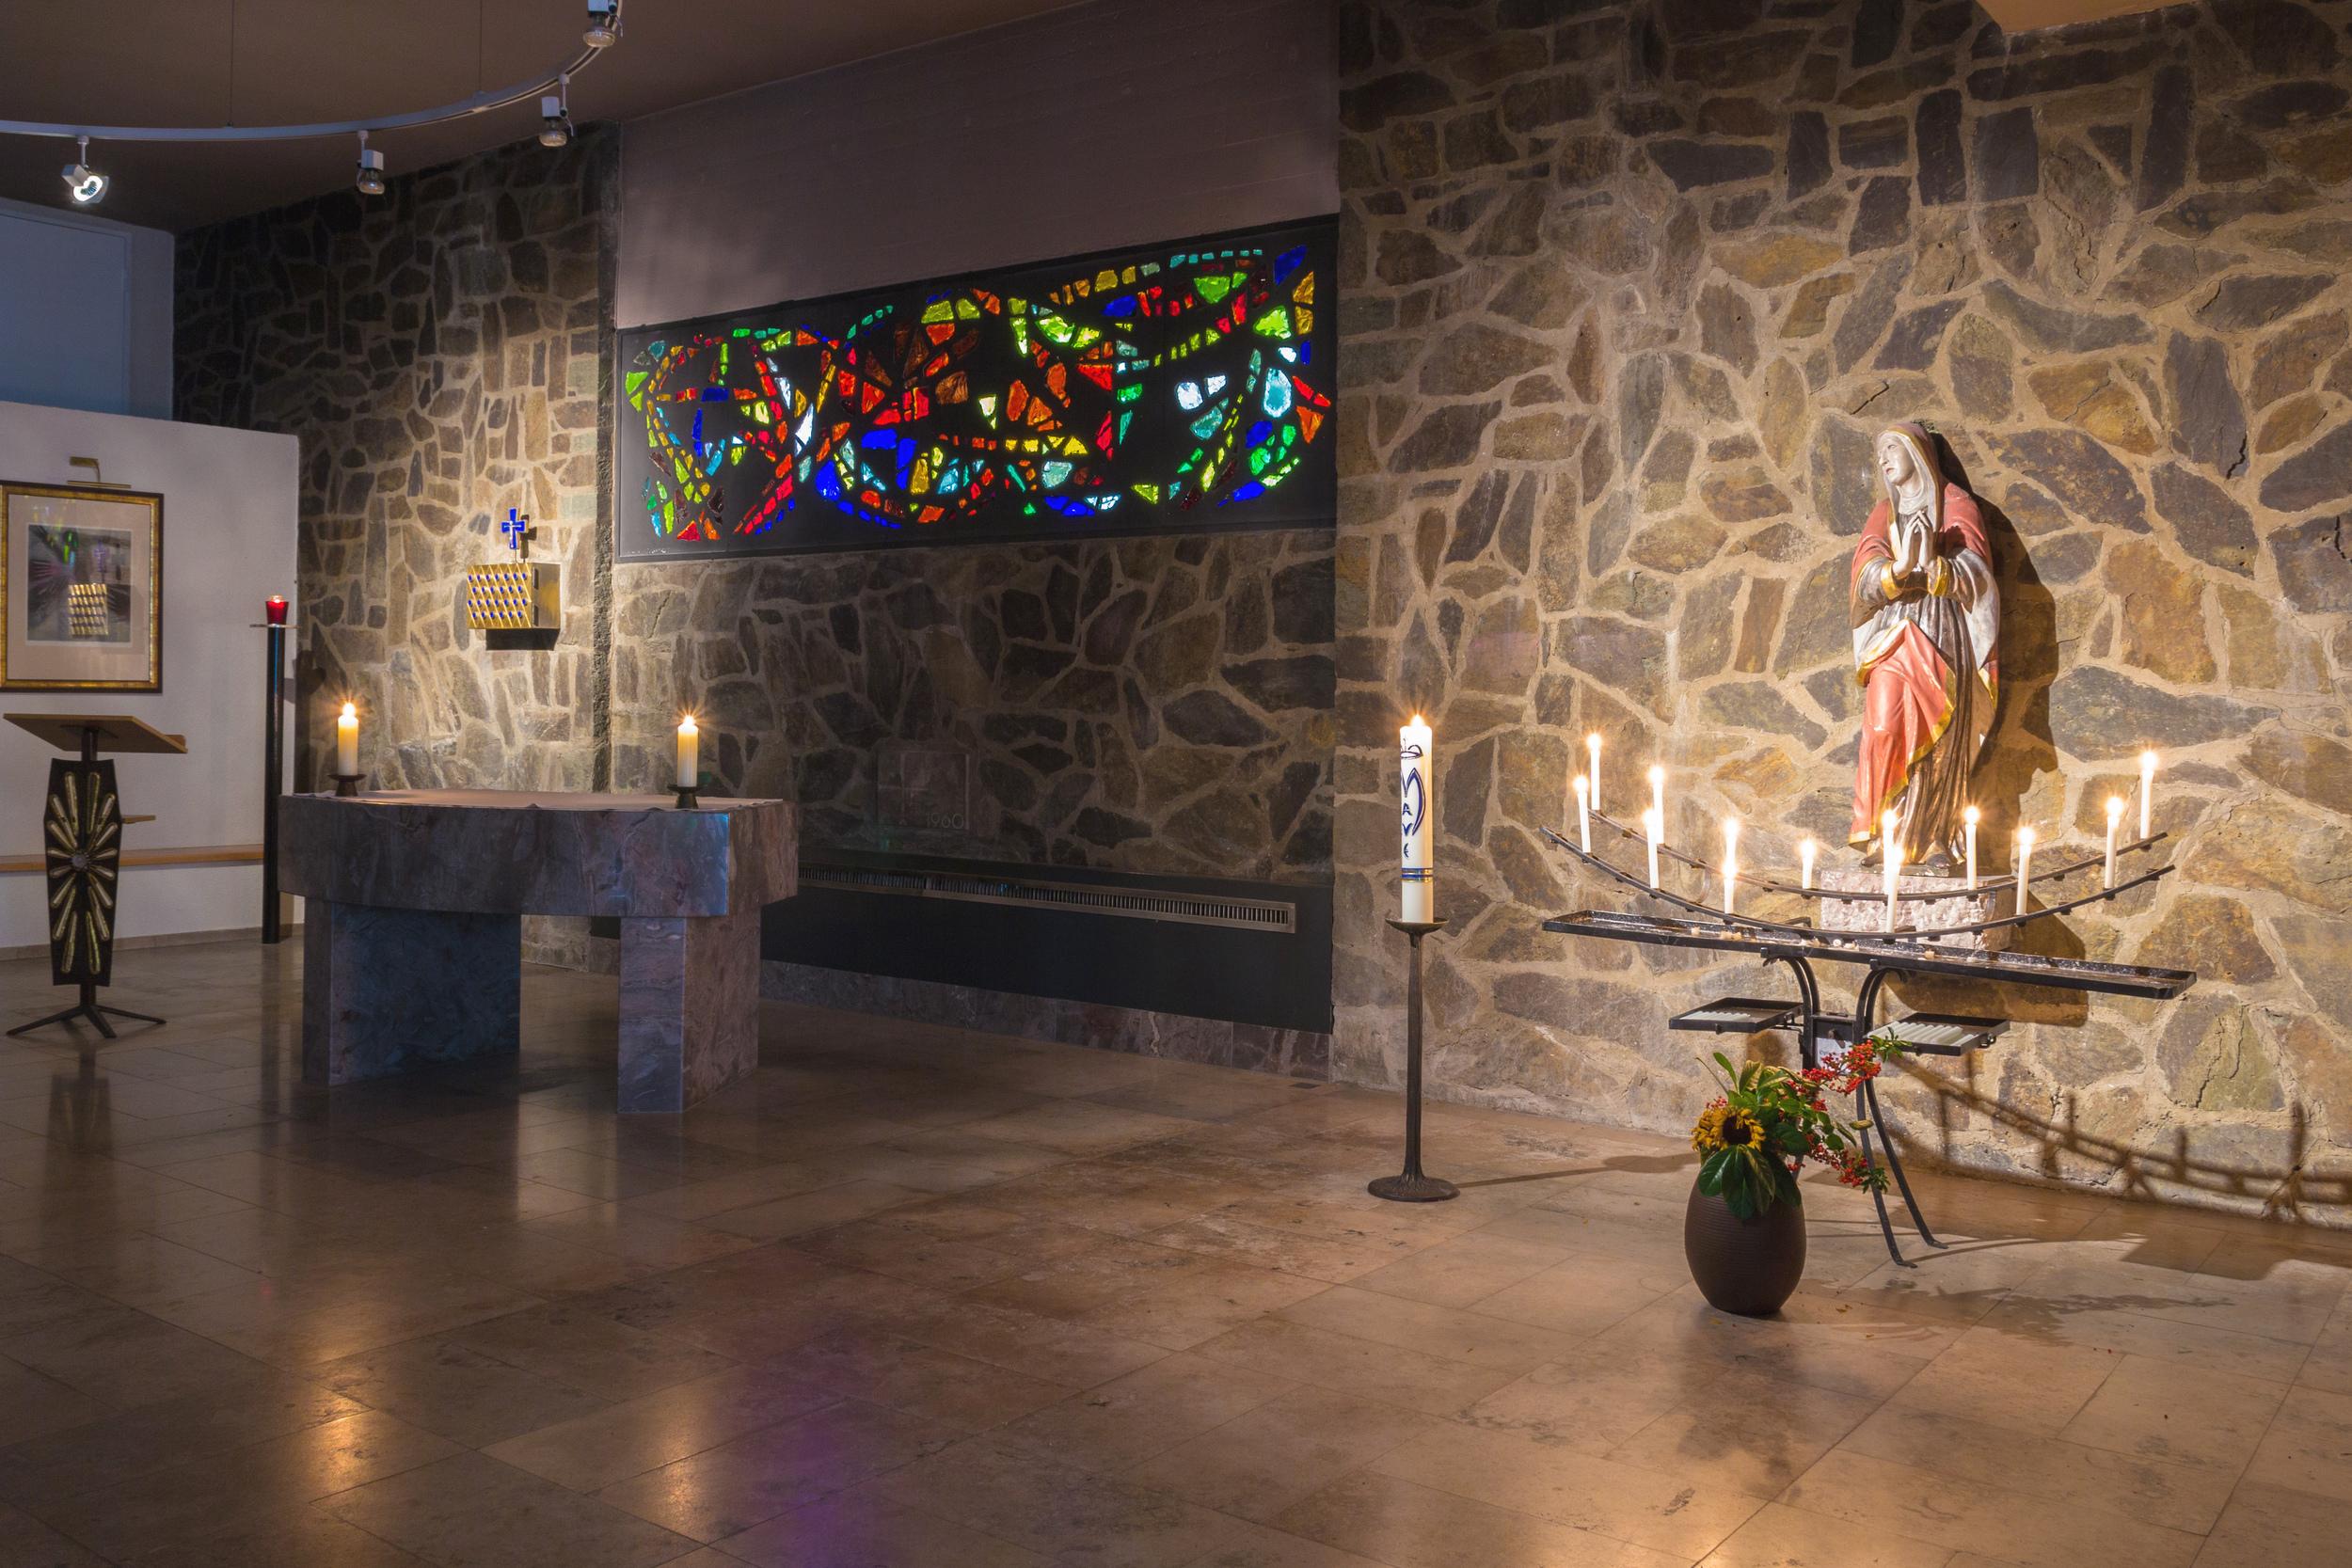 Krypta / Kapelle in St. Mauritius. Foto: B. Dahlhoff